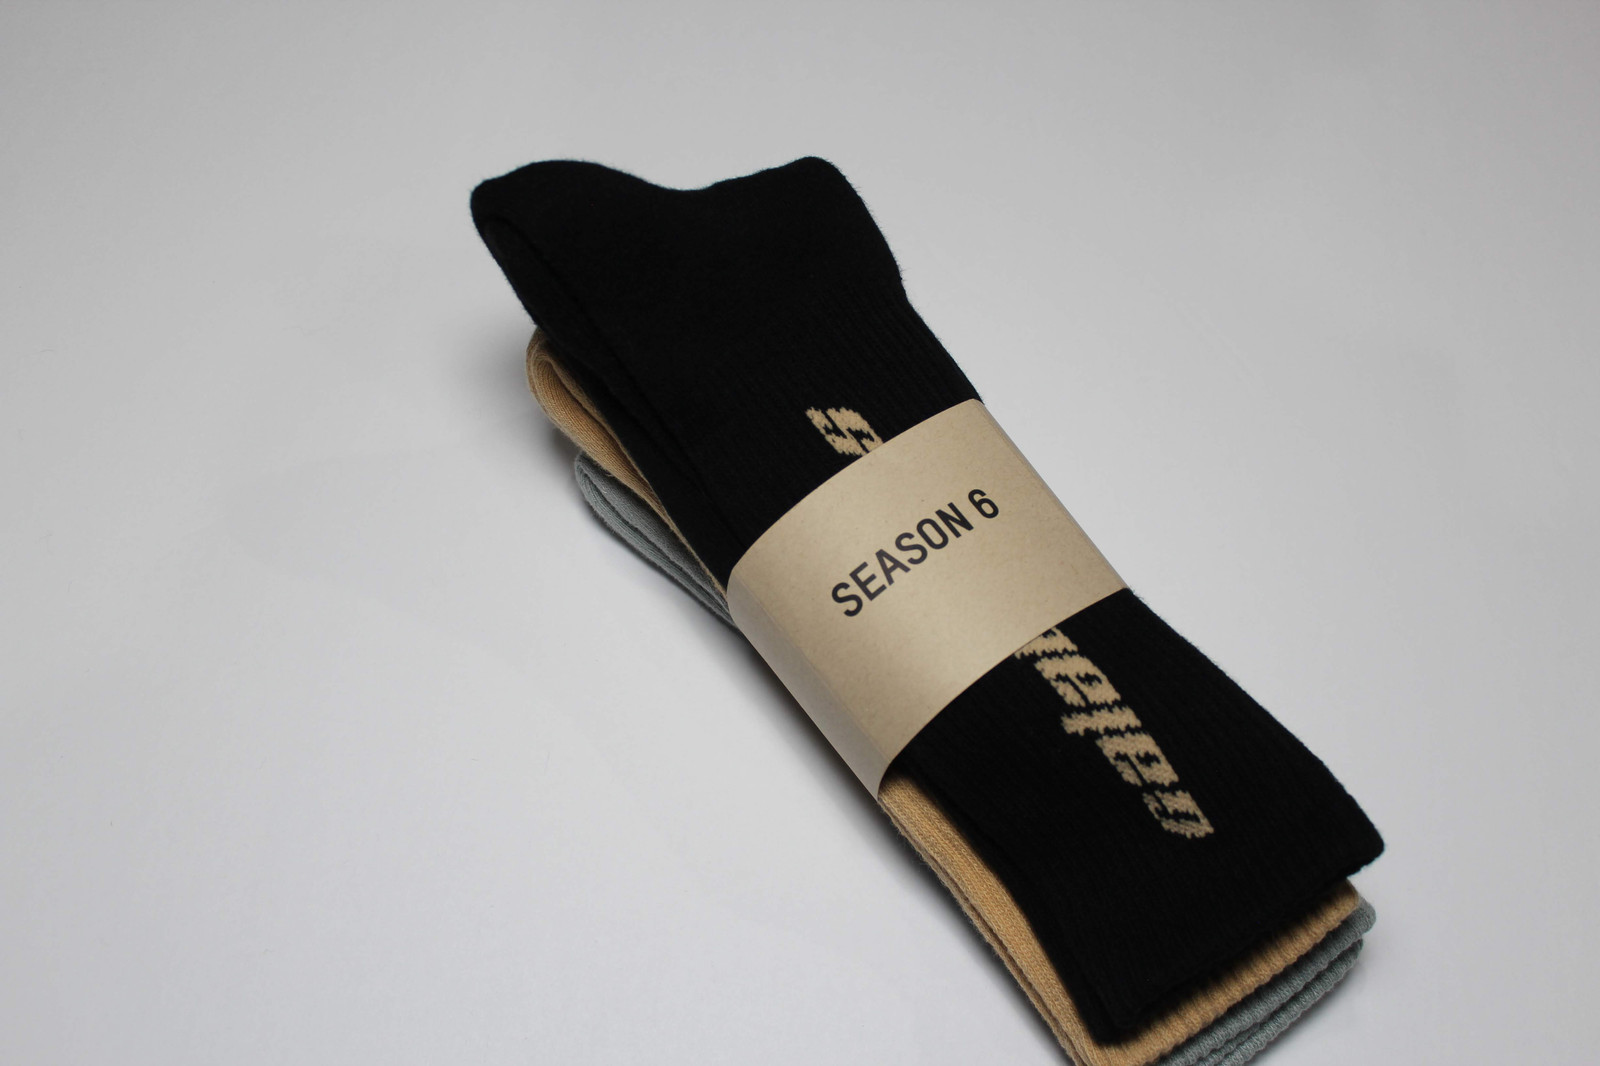 2dc215d55 Yeezy Calabasas Socks (3 Pack) Core Glacier Sand